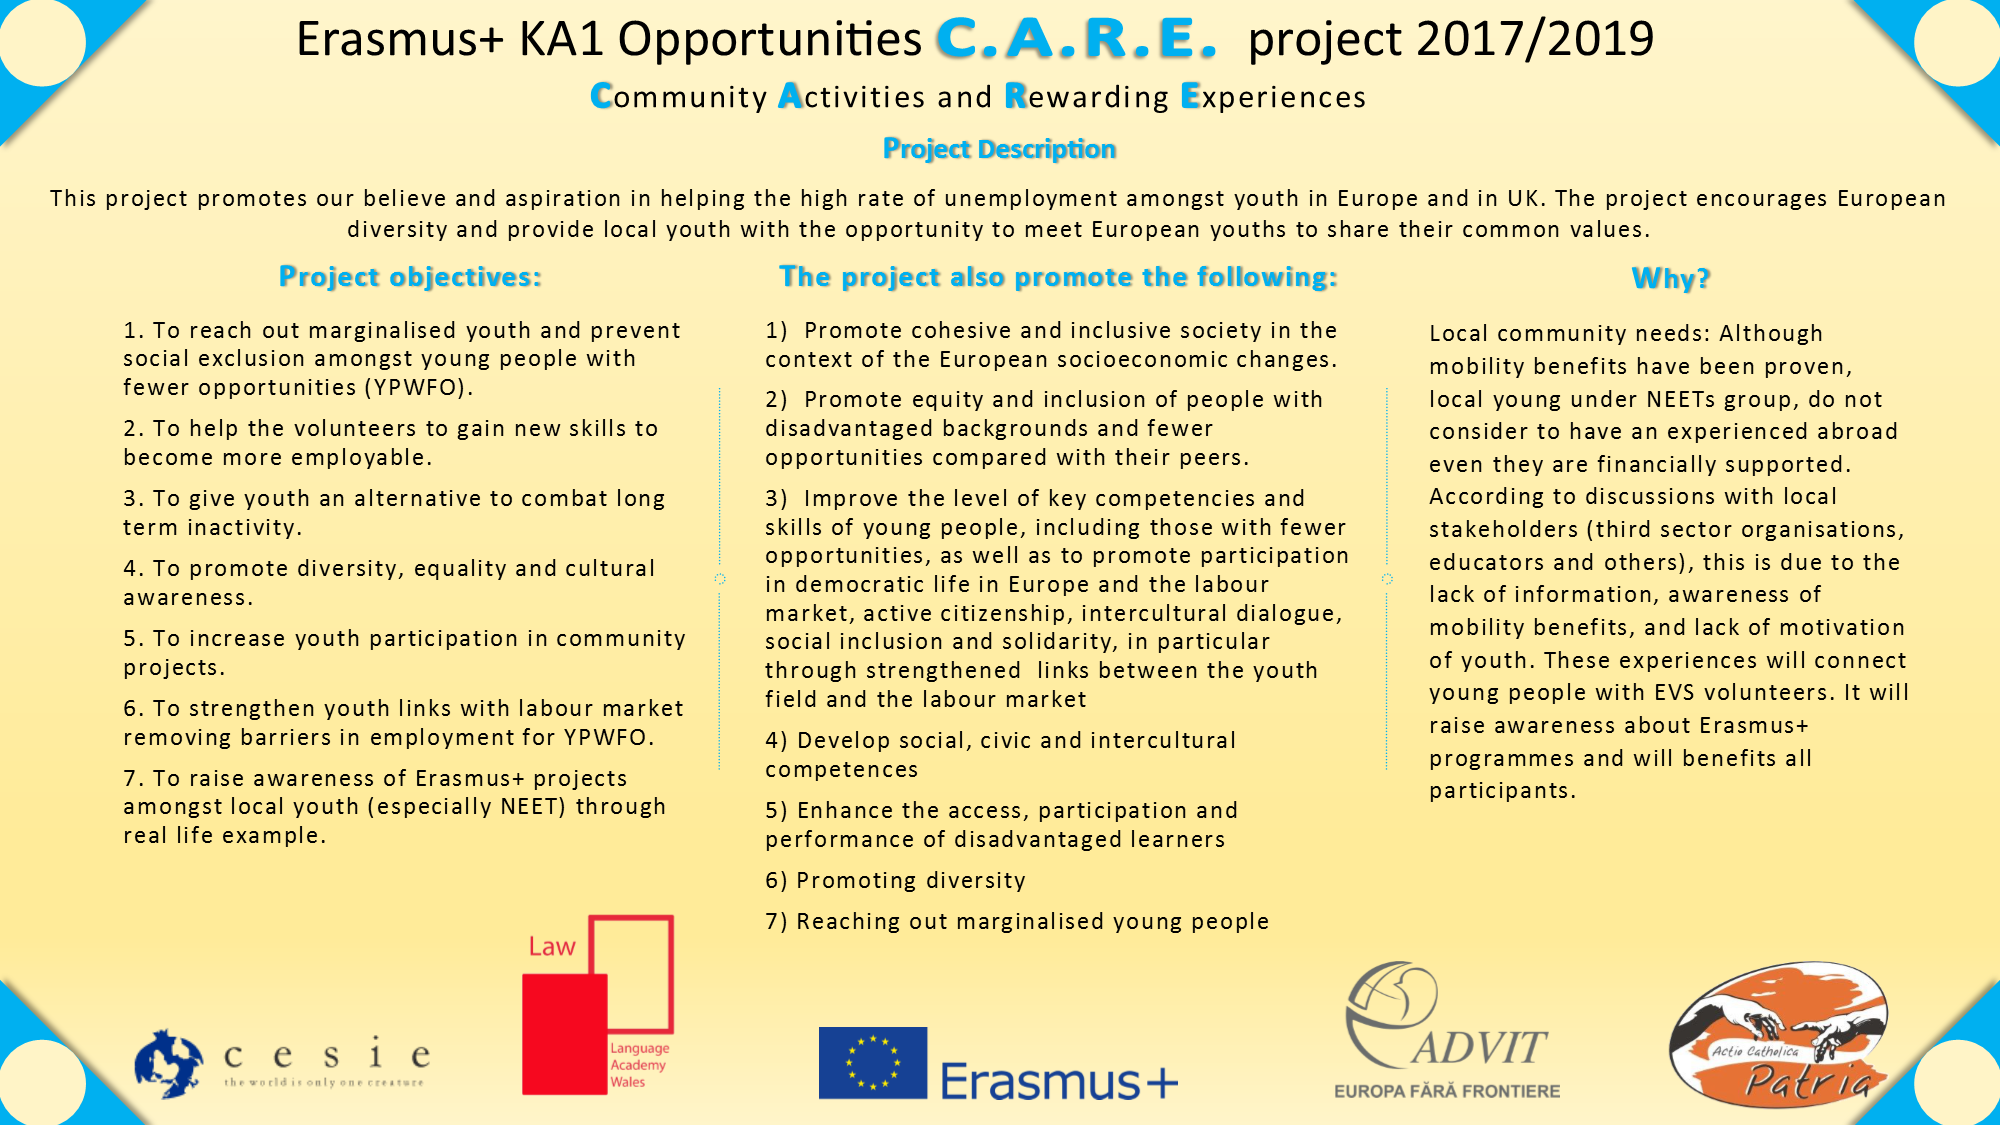 CARE erasmus+ KA1 project Cardiff